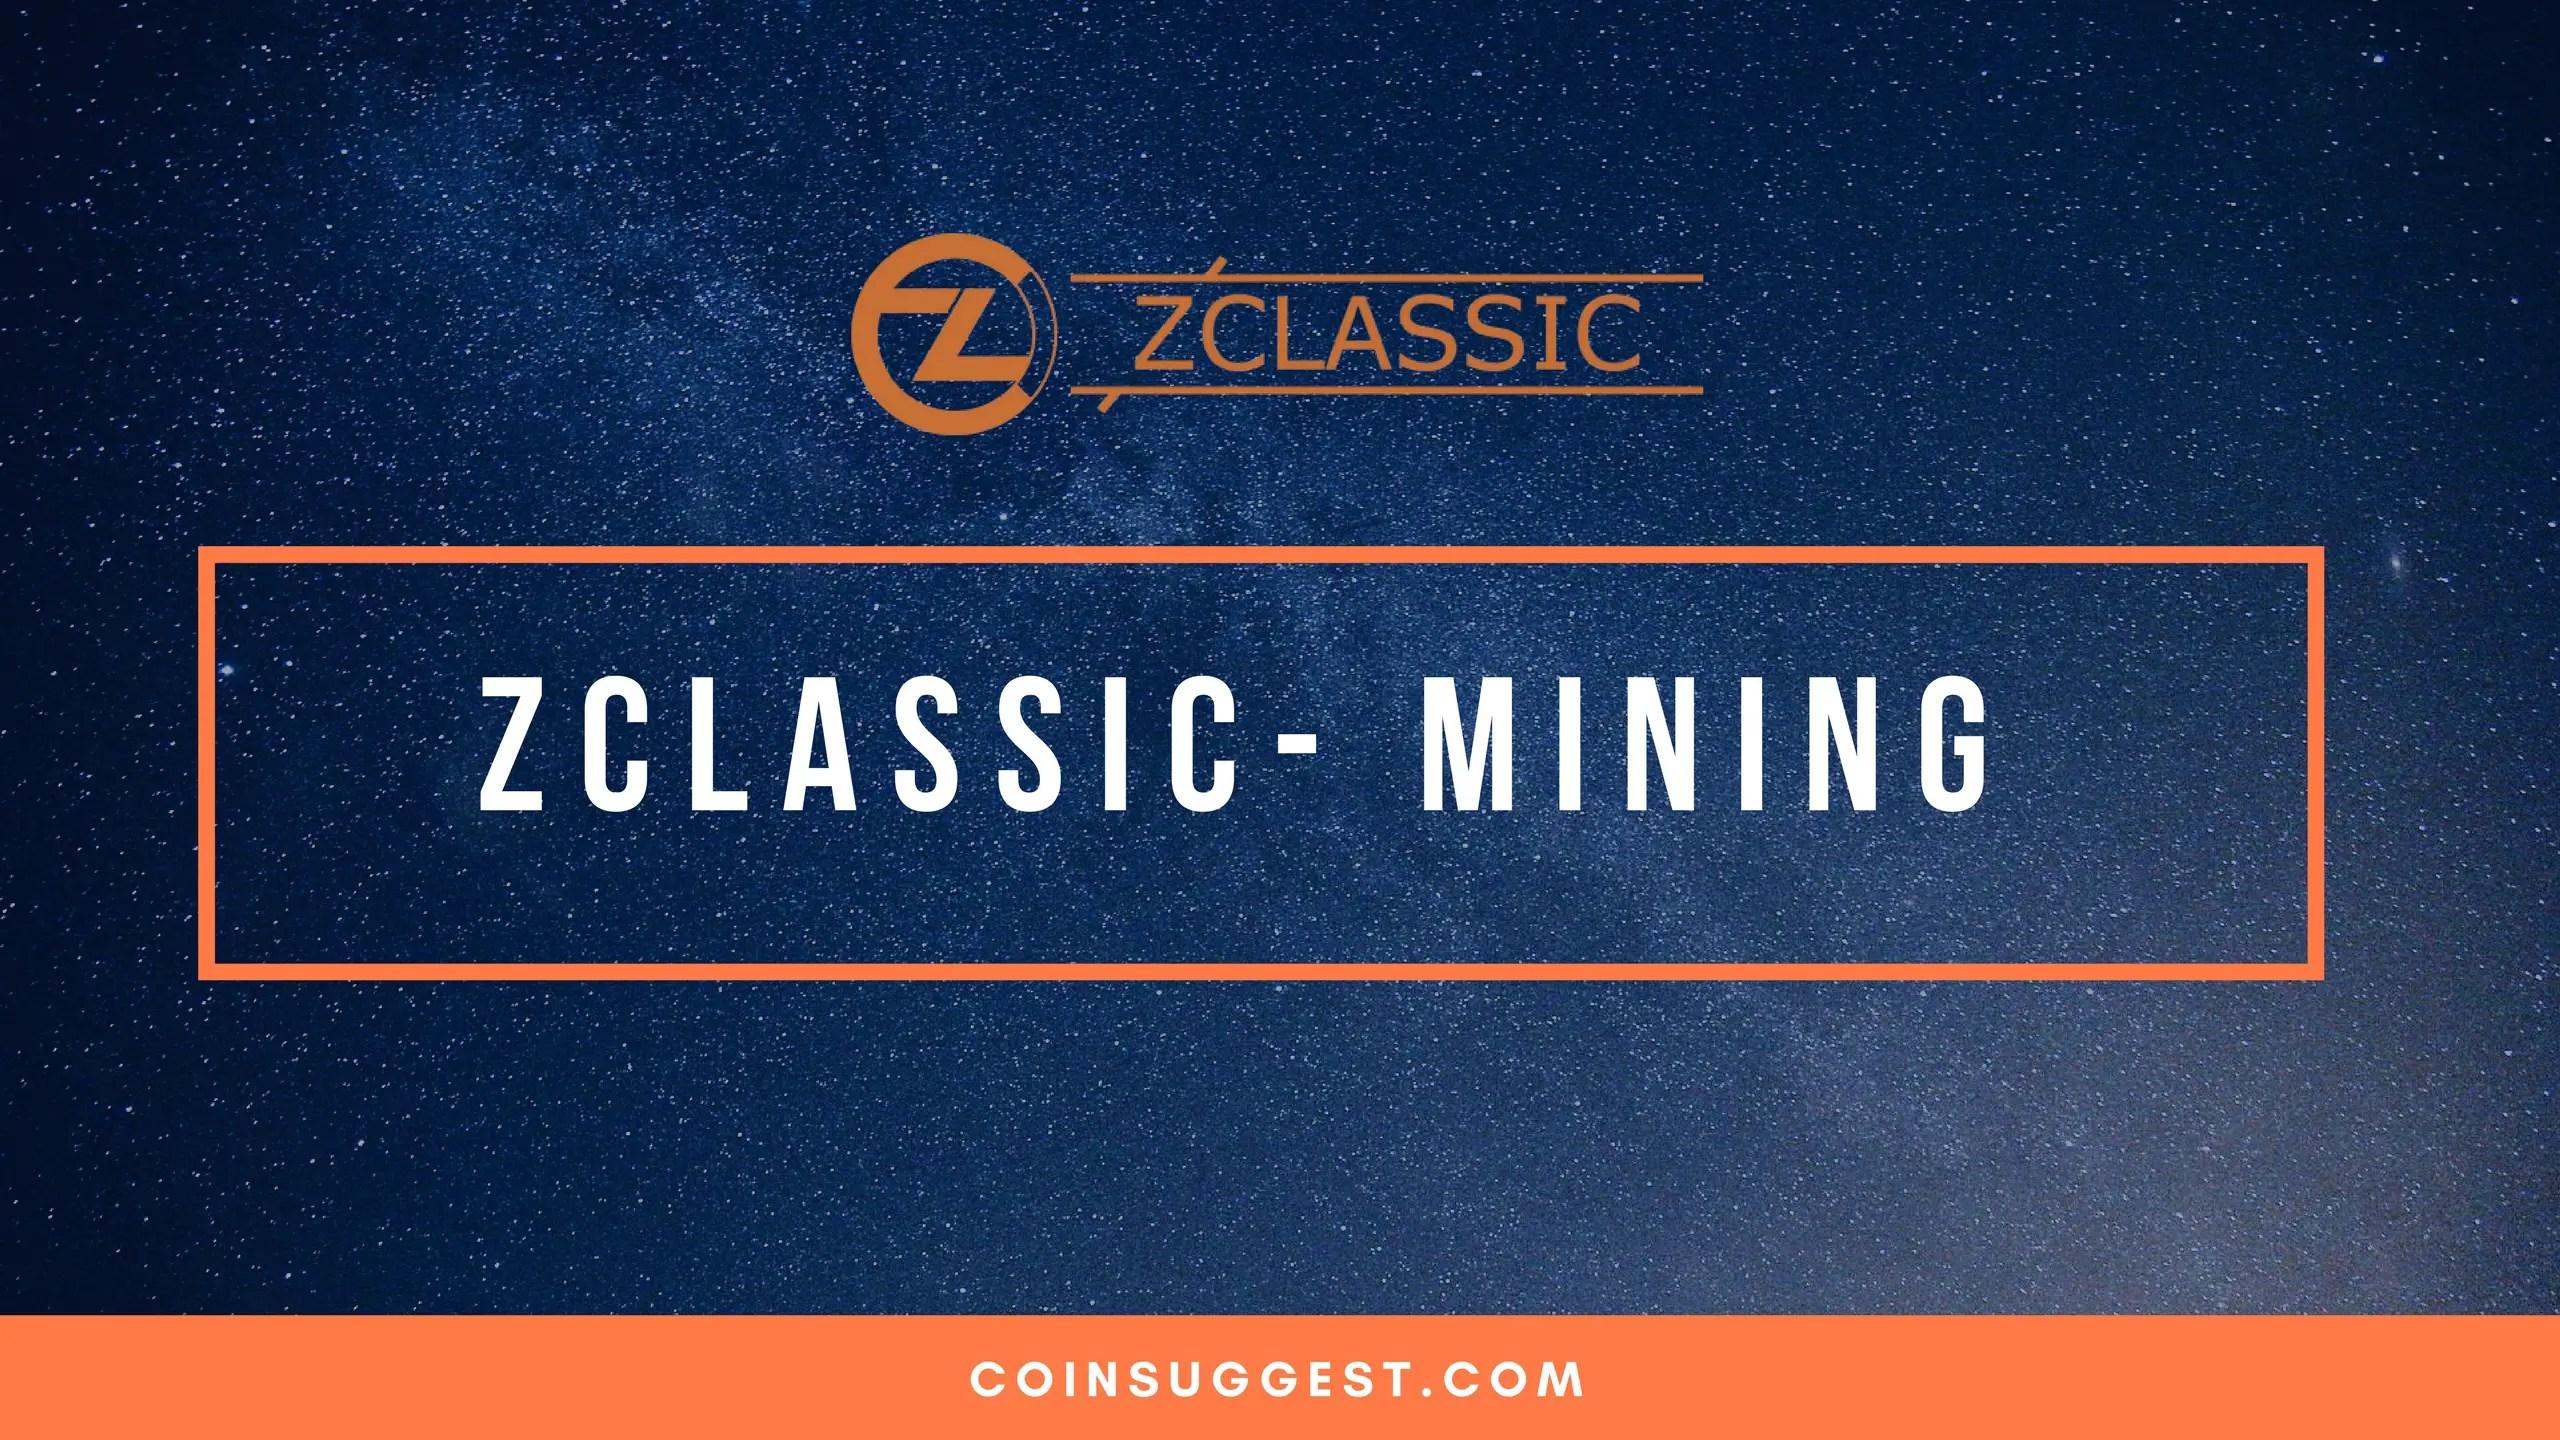 Ewbf Zcash Miner Zclassic Solo Mining – Pacific Lubricant